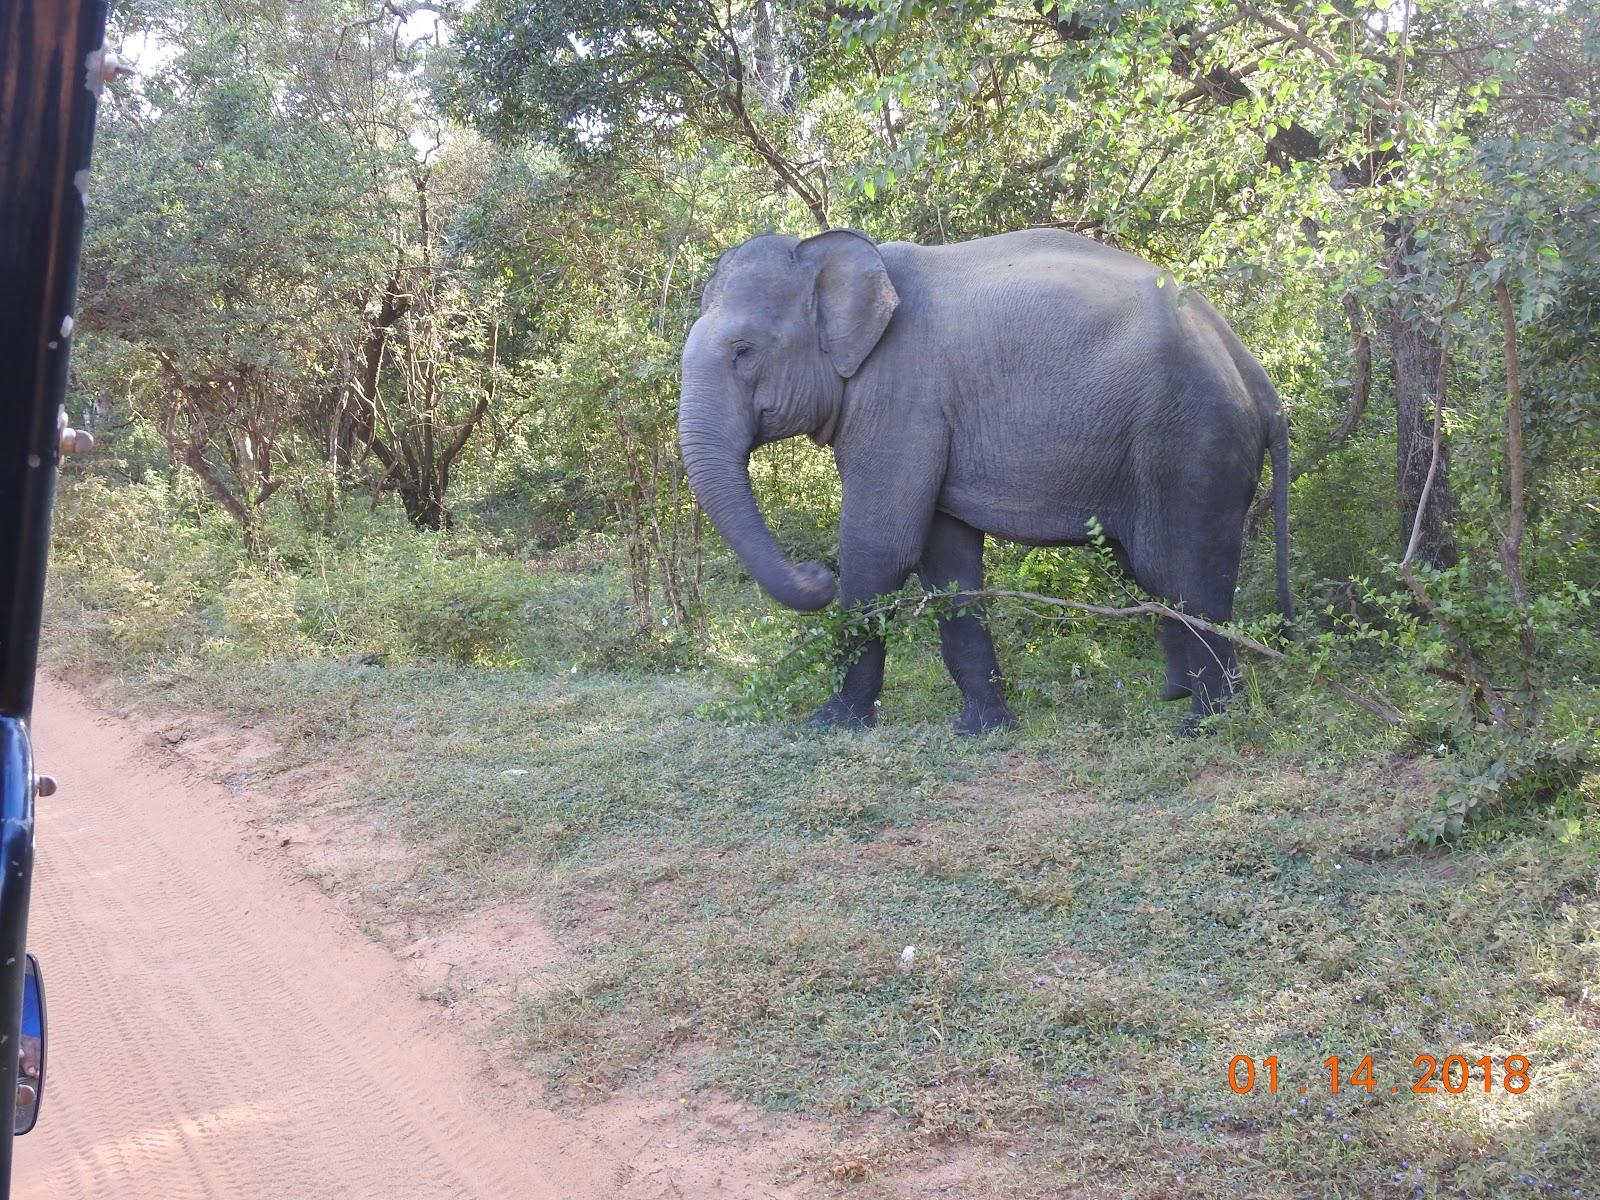 invite-to-paradise-sri-lanka-maldives-holiday-specialists-nutan-vidyut-patel-elephant-safari.jpg